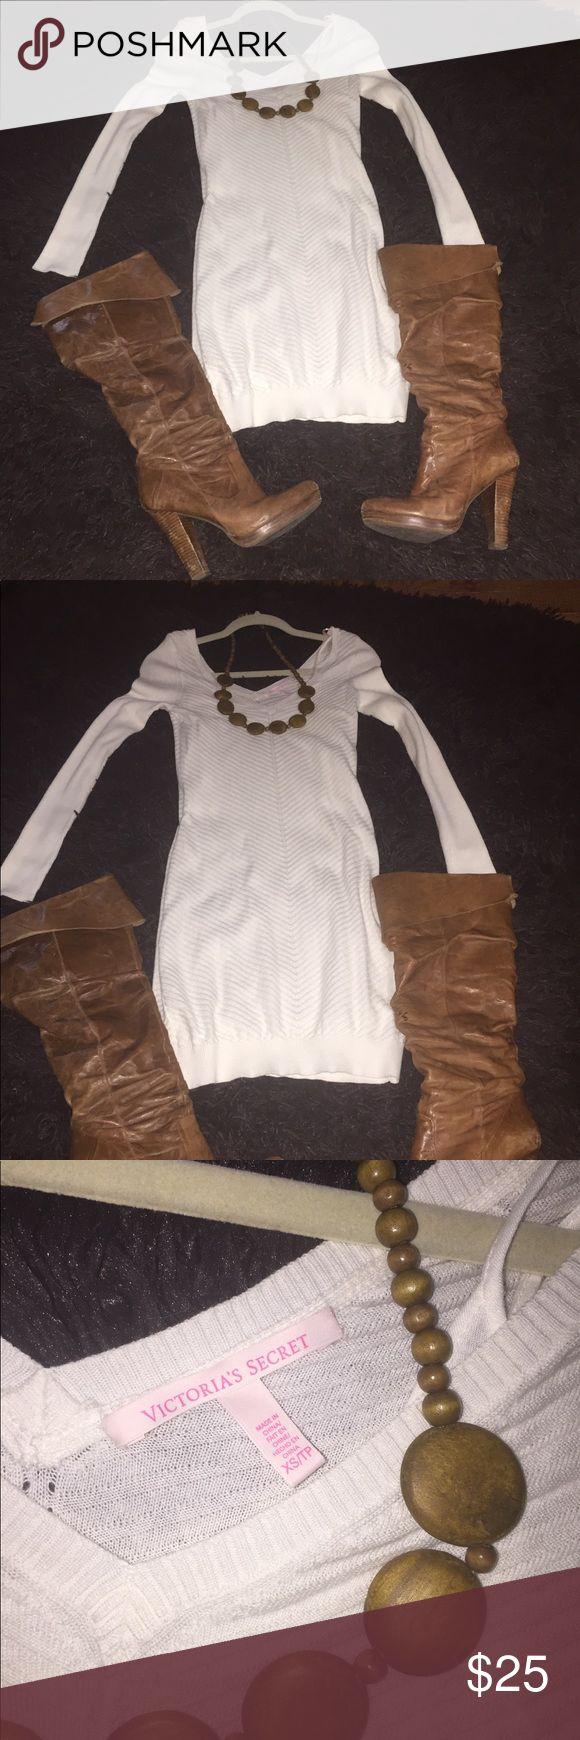 Price Drop! Victoria Secret cream sweater dress VS cream sweater dress. Has detachable thin cotton slip. Never worn. victoria secret Dresses Mini